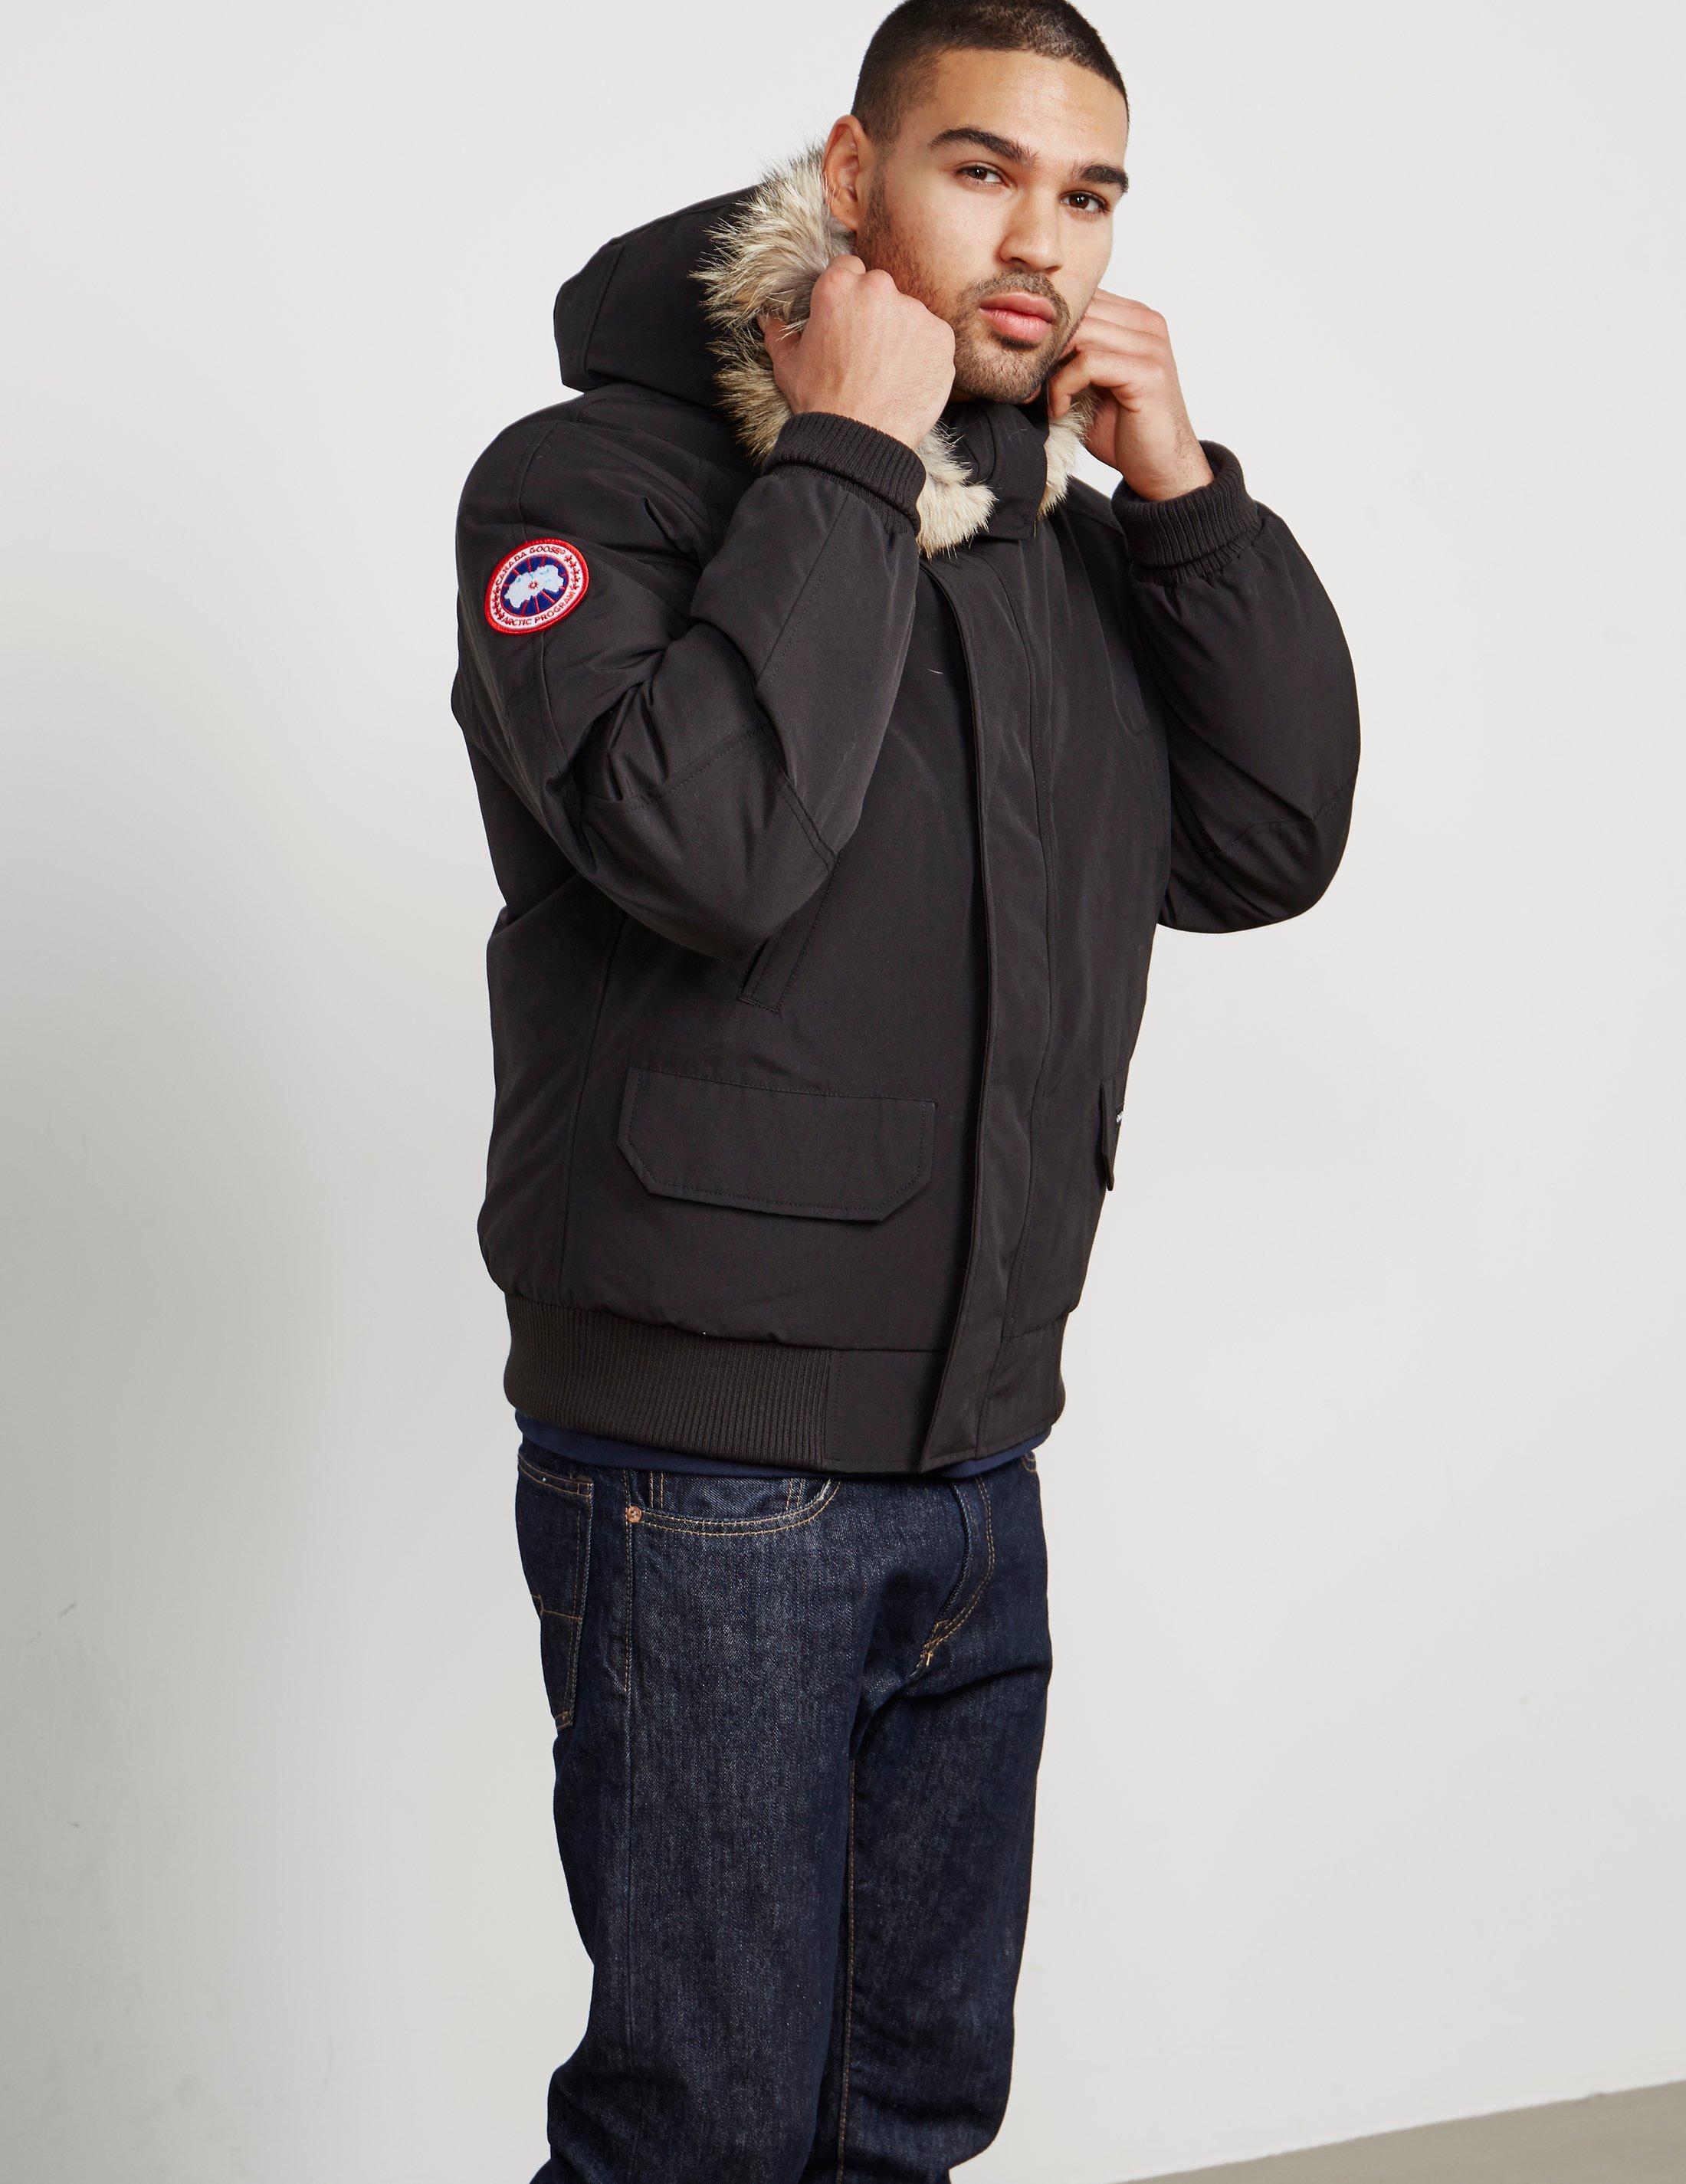 Canada Goose trillium parka outlet official - canada goose sale jackets